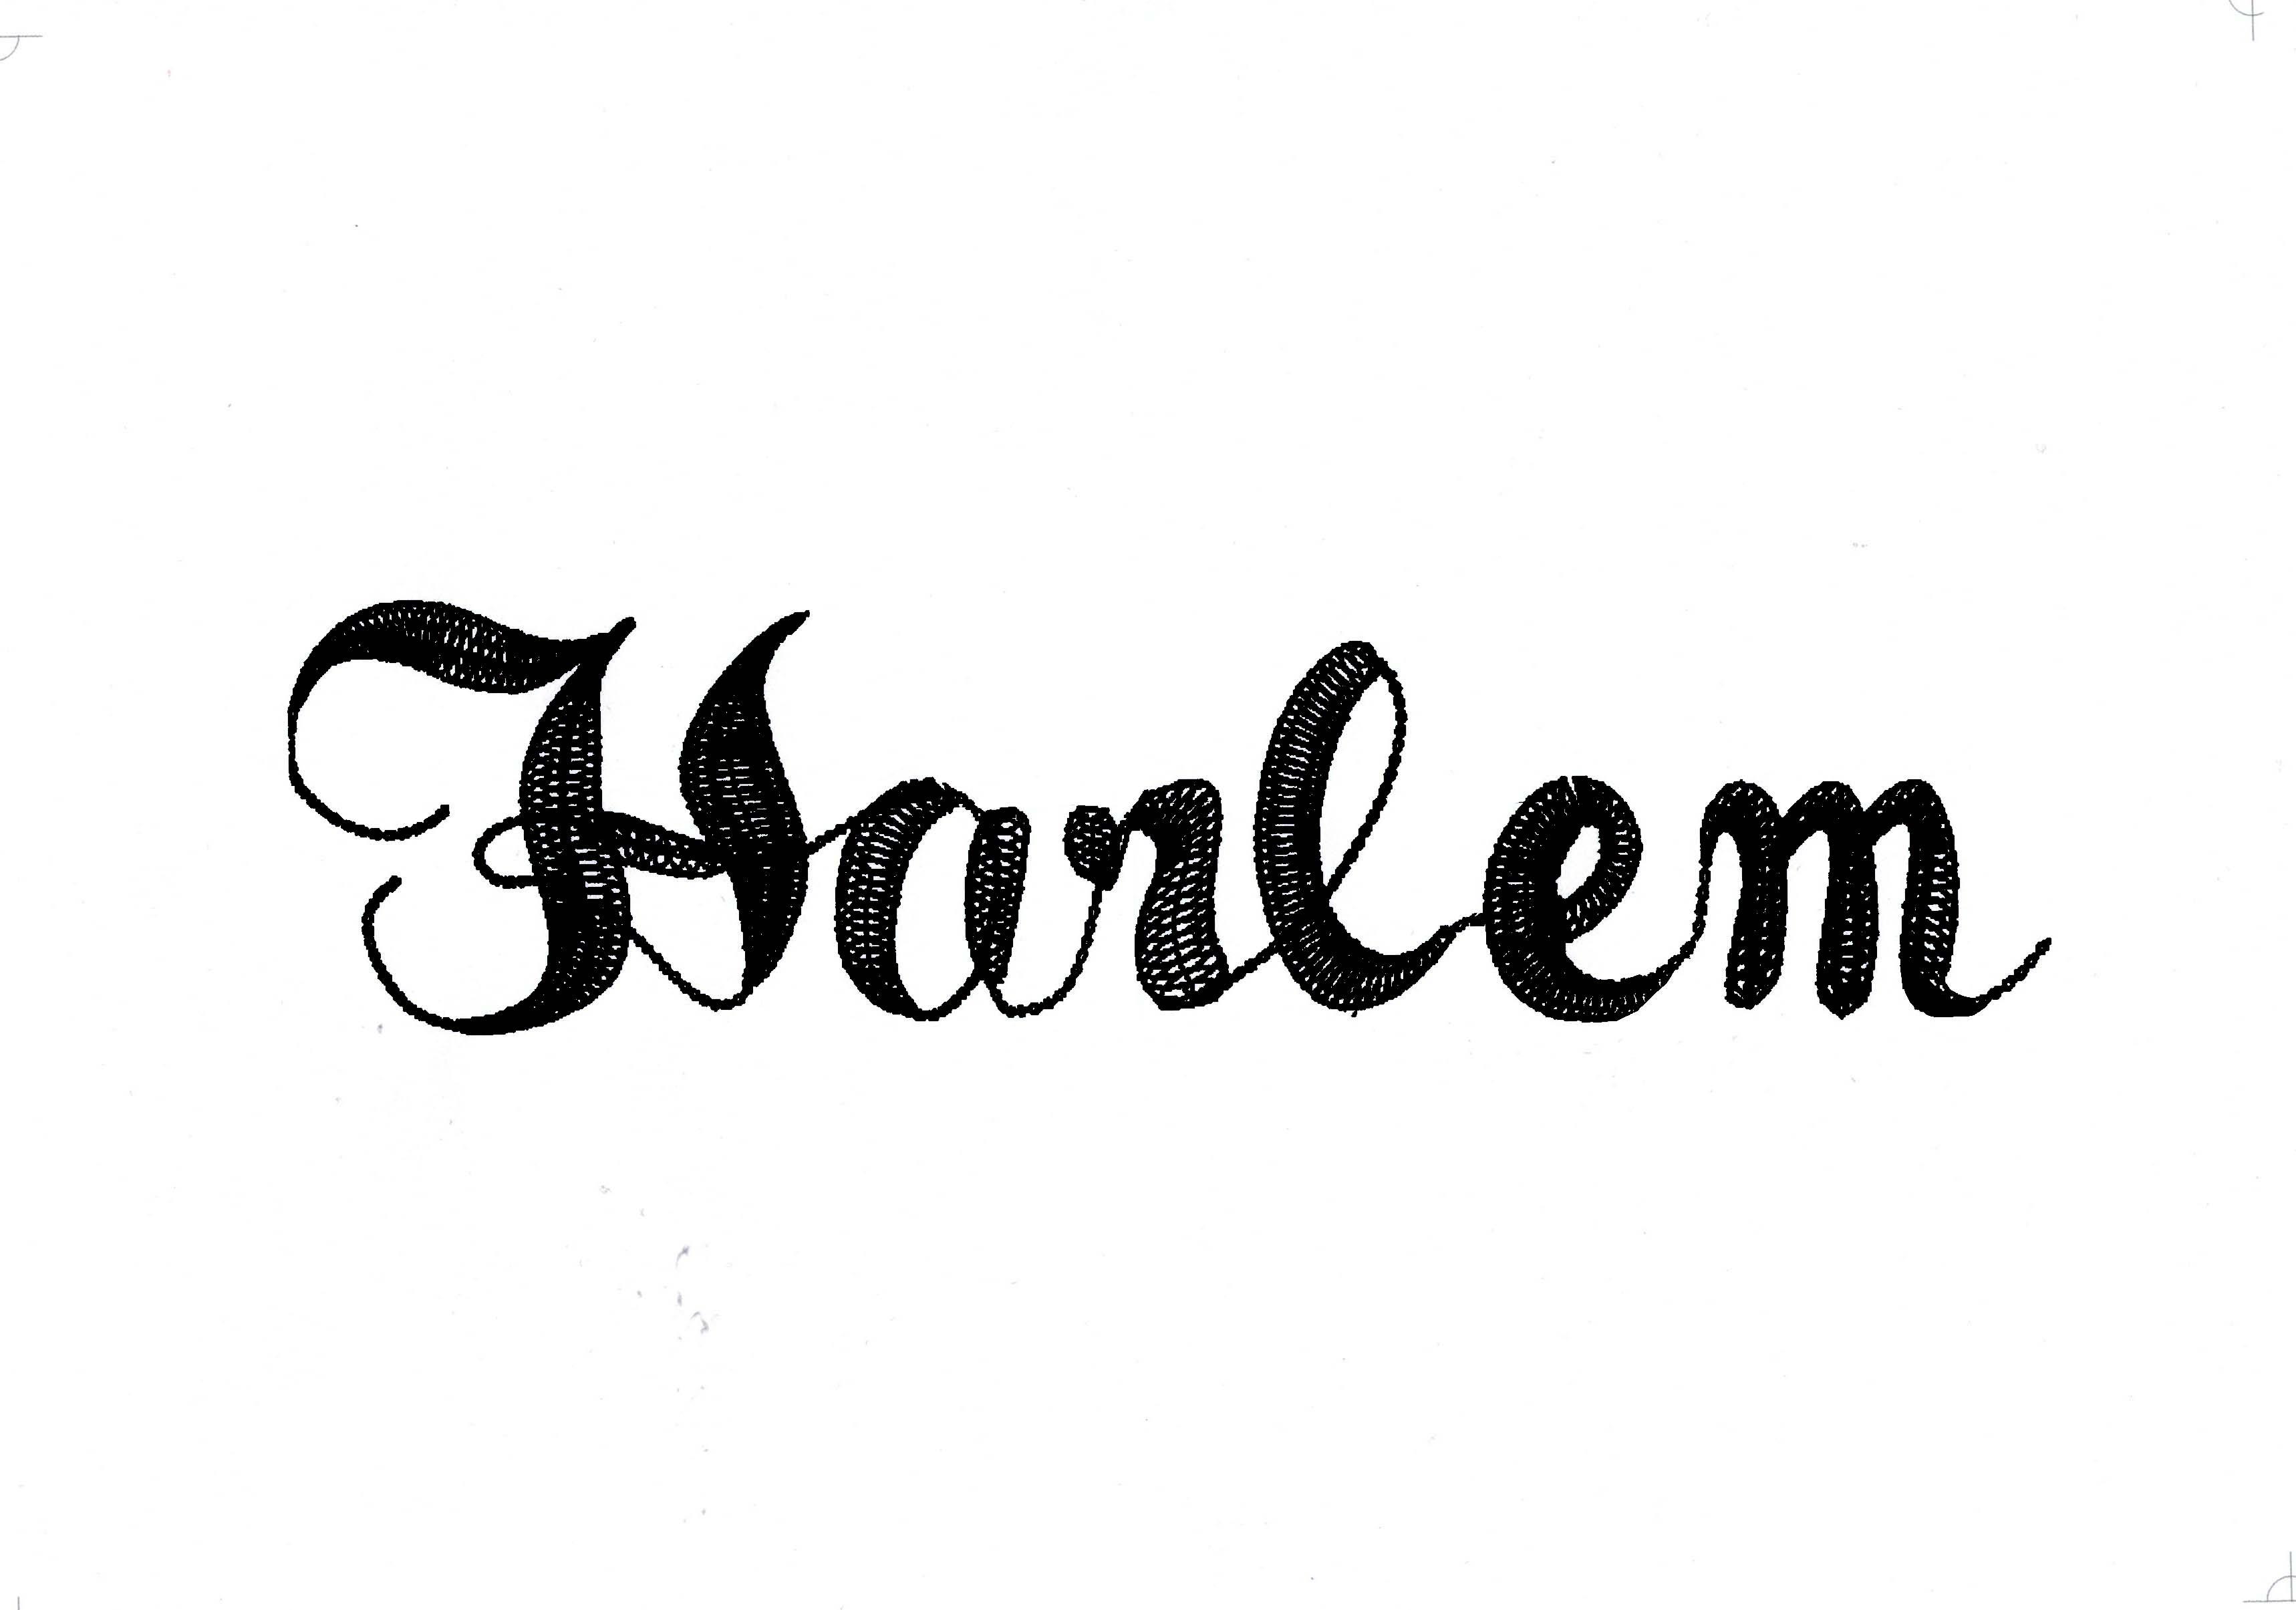 BRODERIE-HARLEM